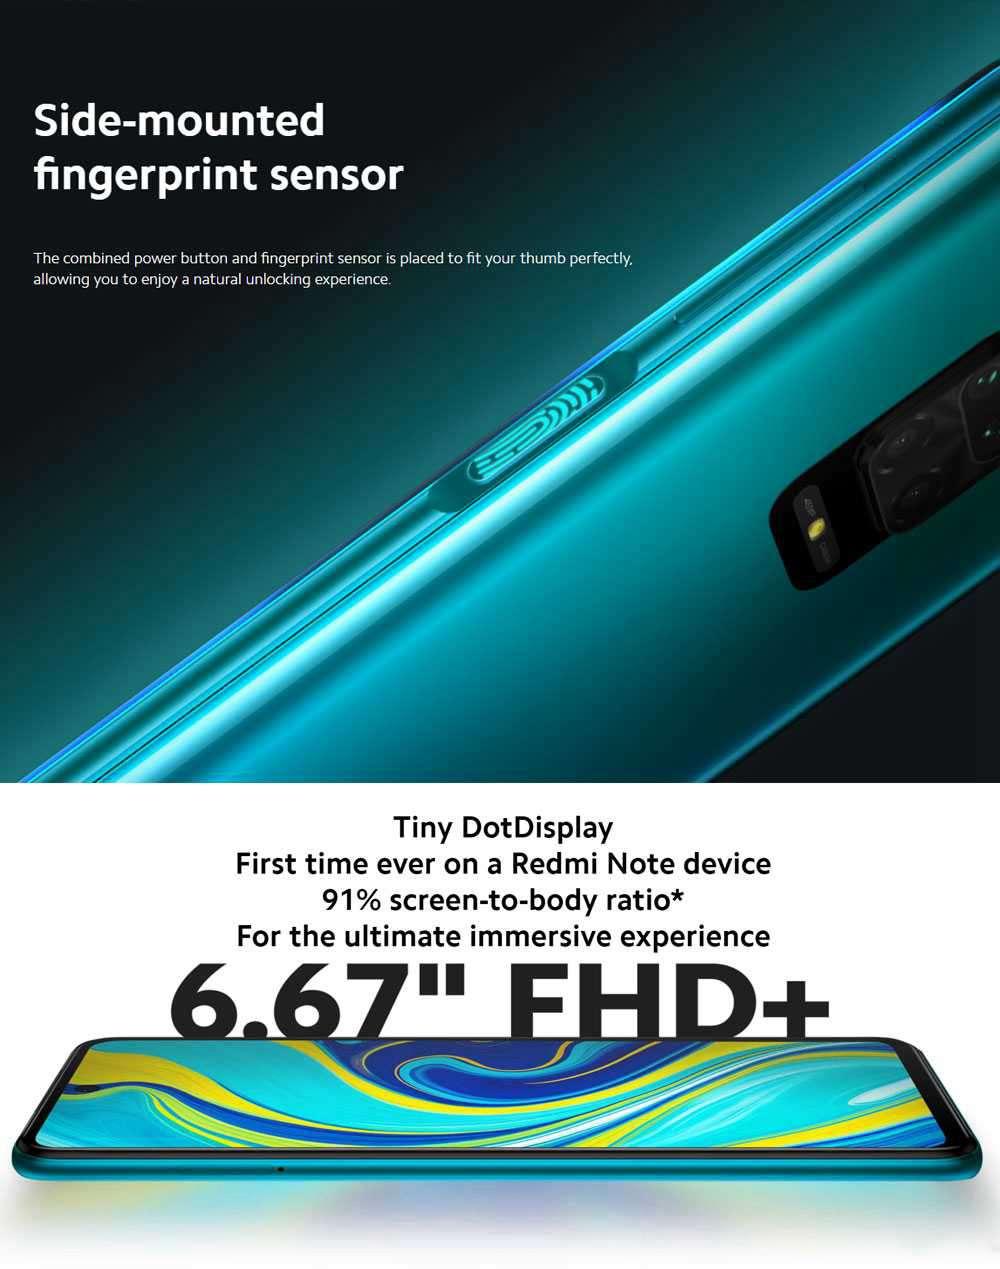 Xiaomi Redmi Note 9S 6.67 Inch 4G LTE Smartphone Qualcomm Snapdragon 720G 6GB RAM 128GB ROM Quad Rear Cameras Android 10.0 Dual SIM Dual Standby Global Version - Aurora Blue